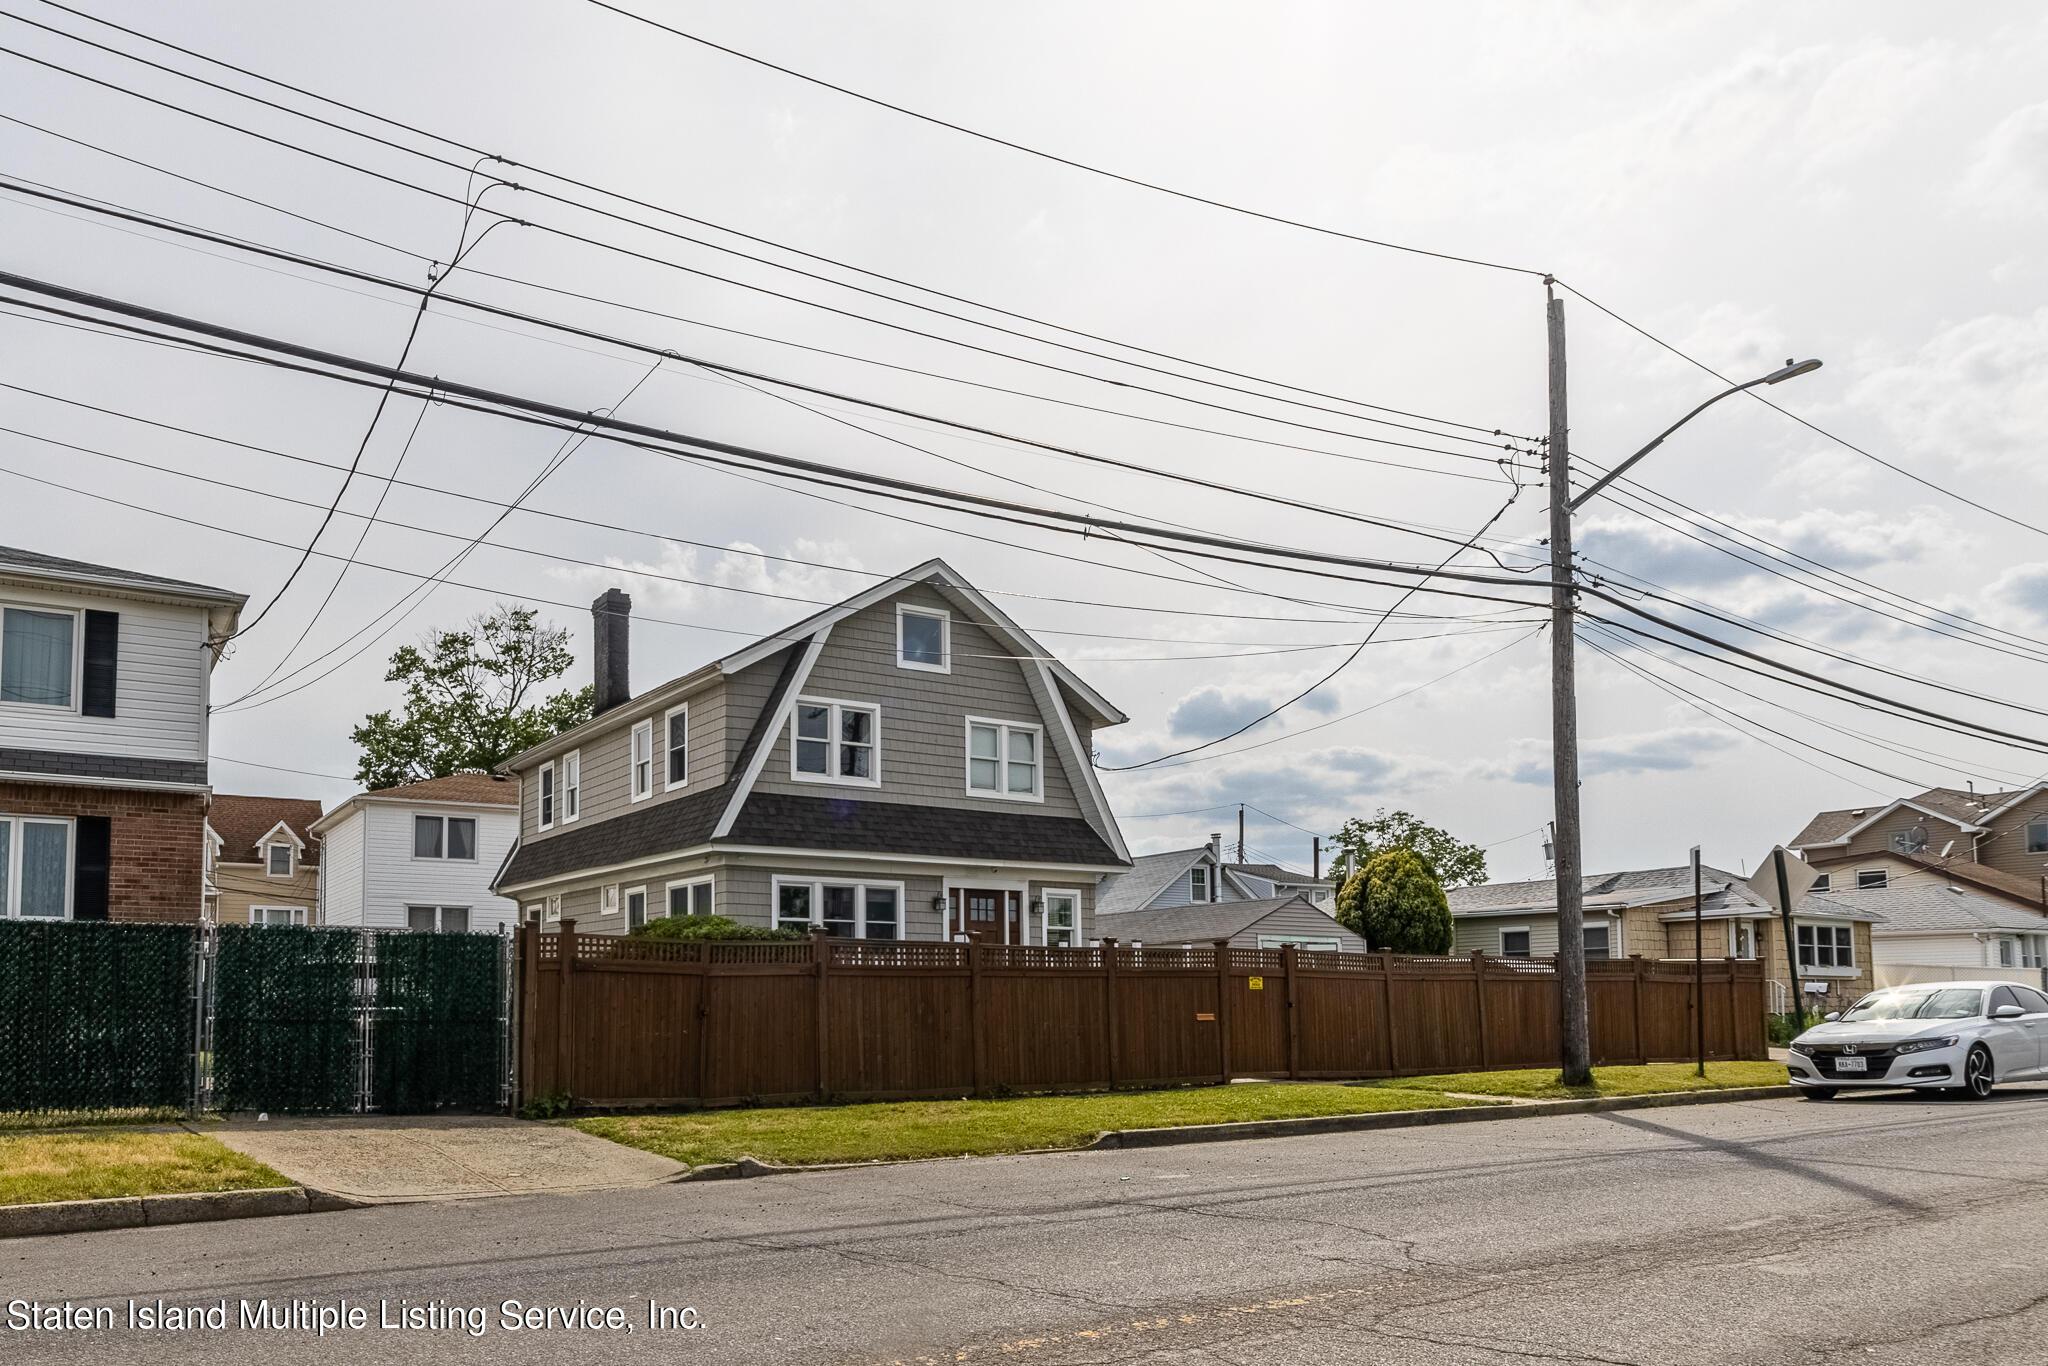 Single Family - Detached 790 New Dorp Lane  Staten Island, NY 10306, MLS-1146574-7